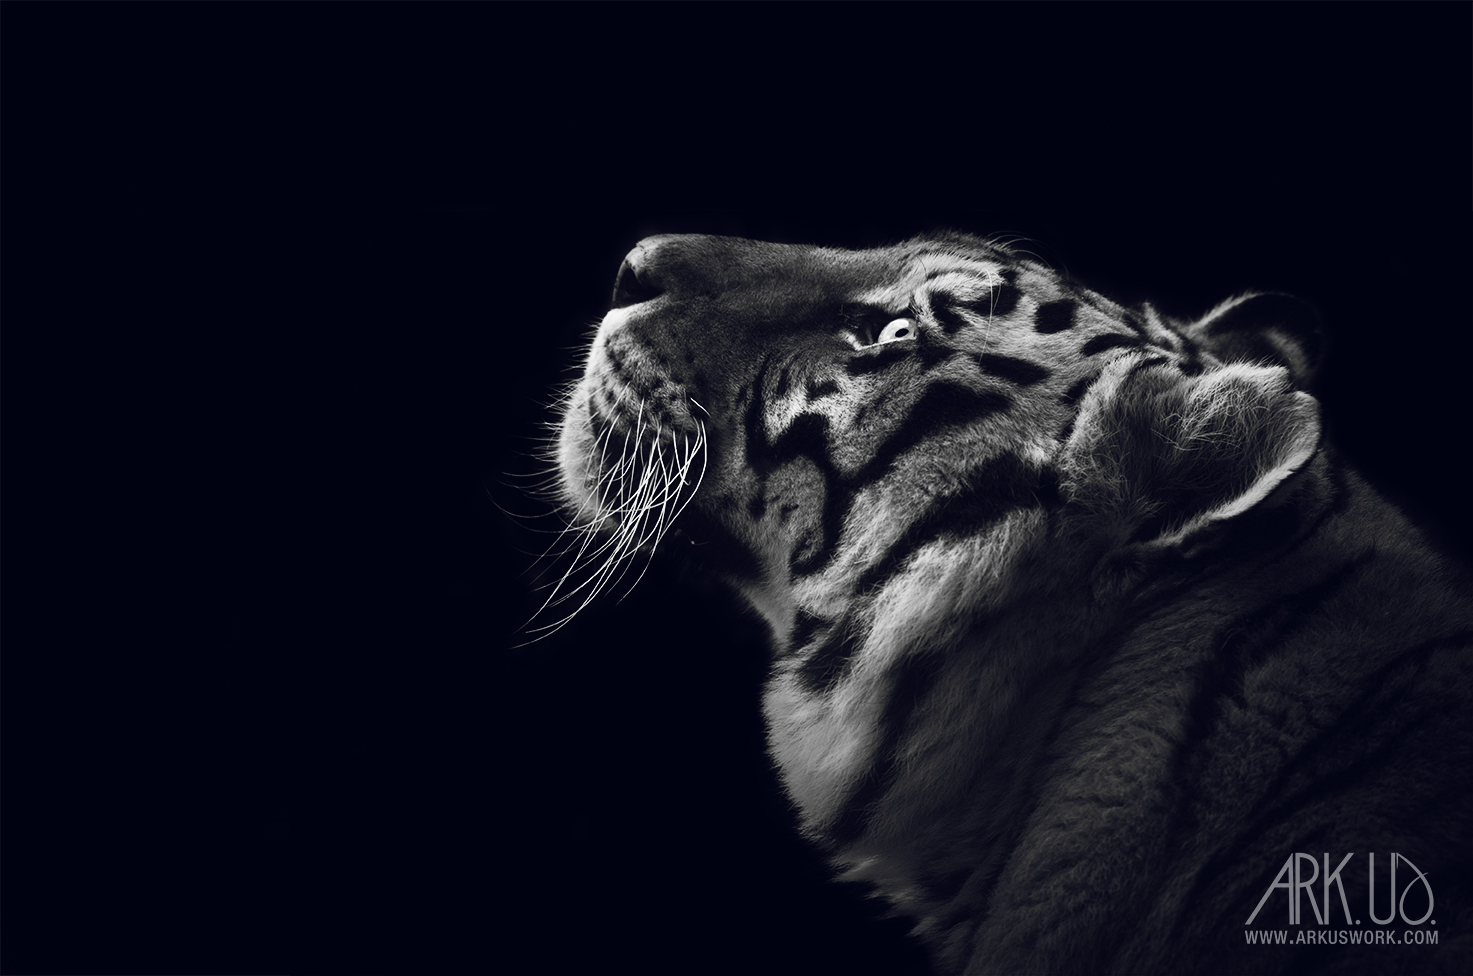 tigre,noir,blanc,animal,sauvage,félin,décoration,image,photo,photographie,photographe,animaux;animal,